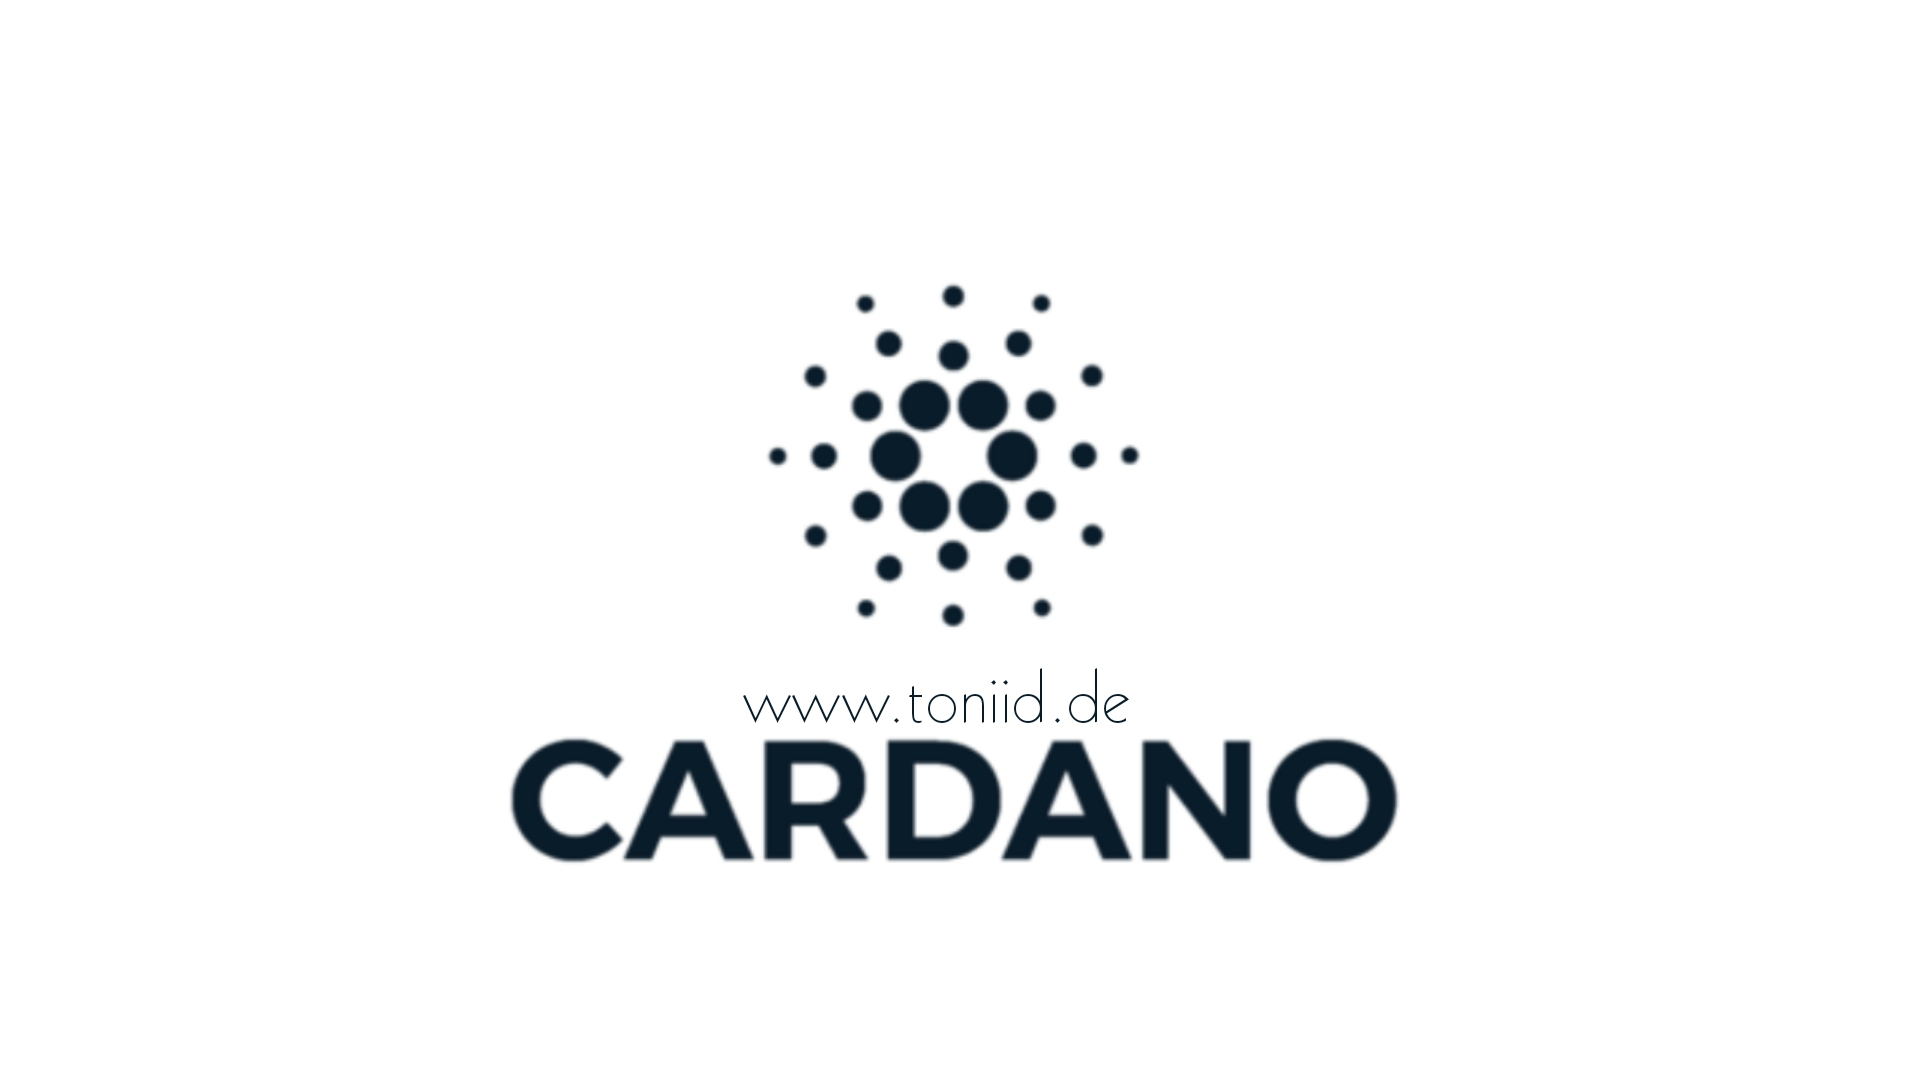 Apa itu Cardano (ADA)?